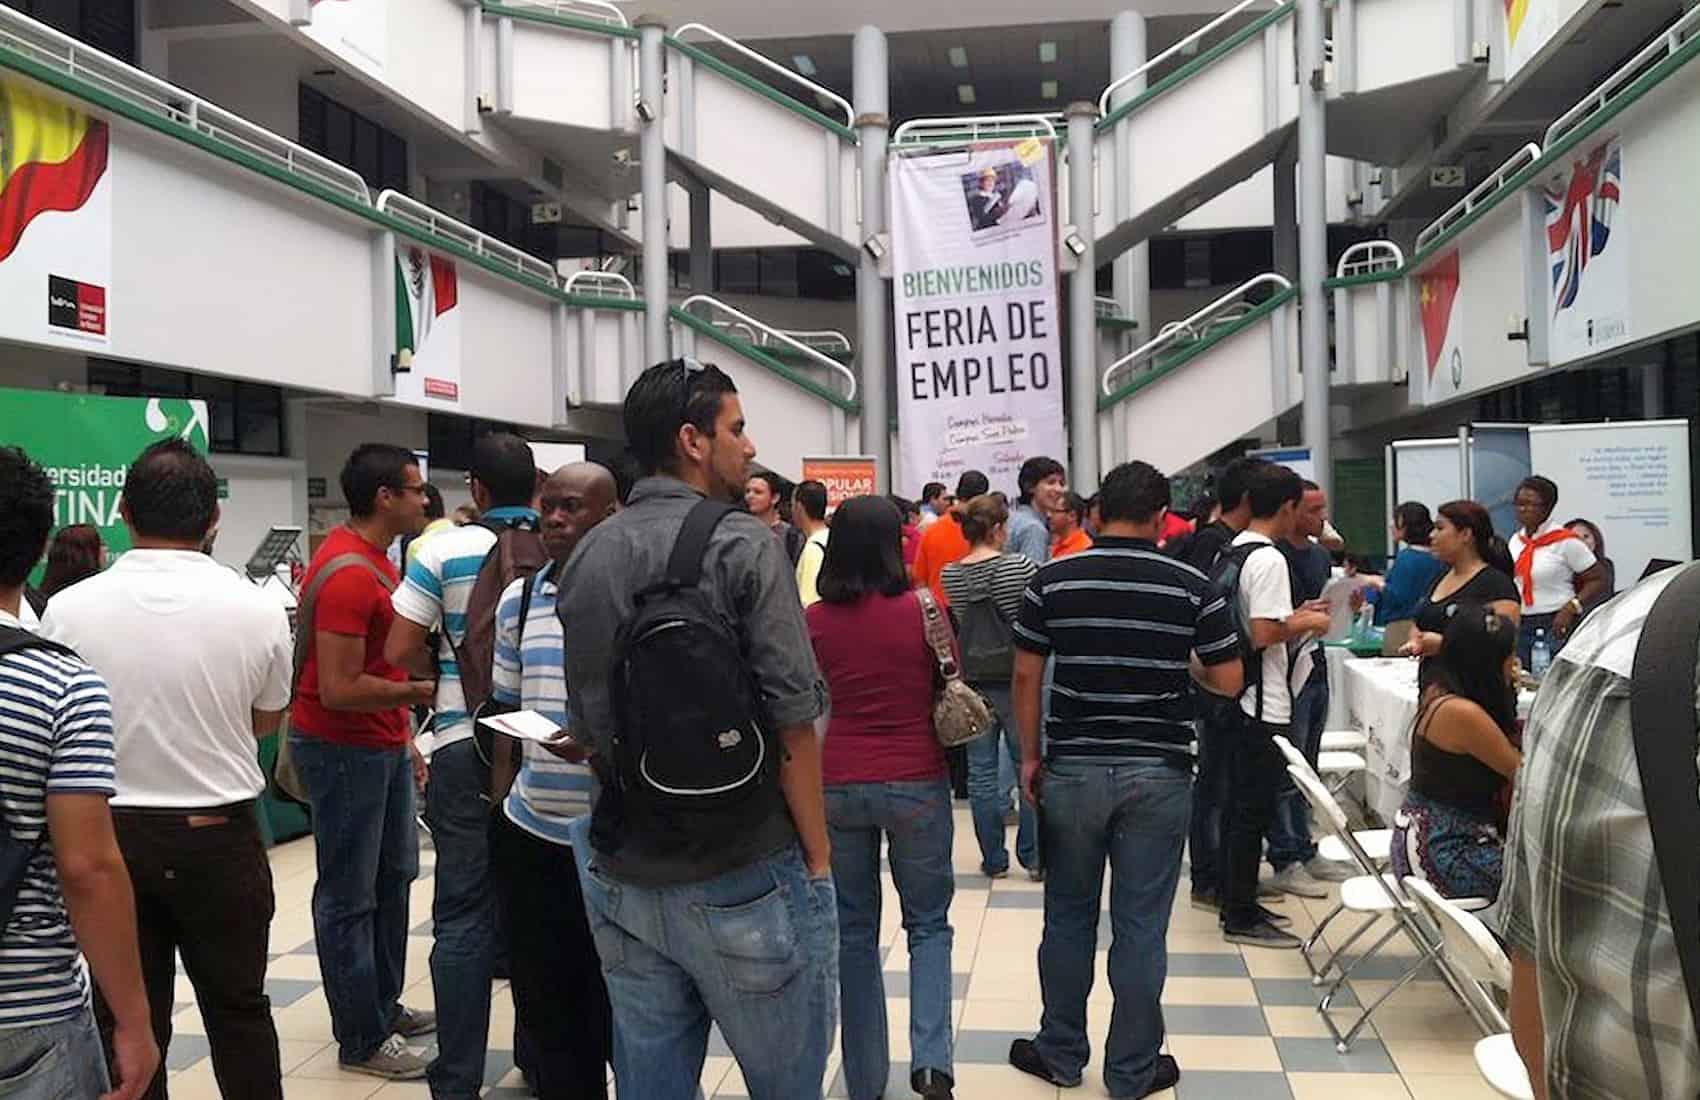 Job fair at Universidad Latina de Costa Rica